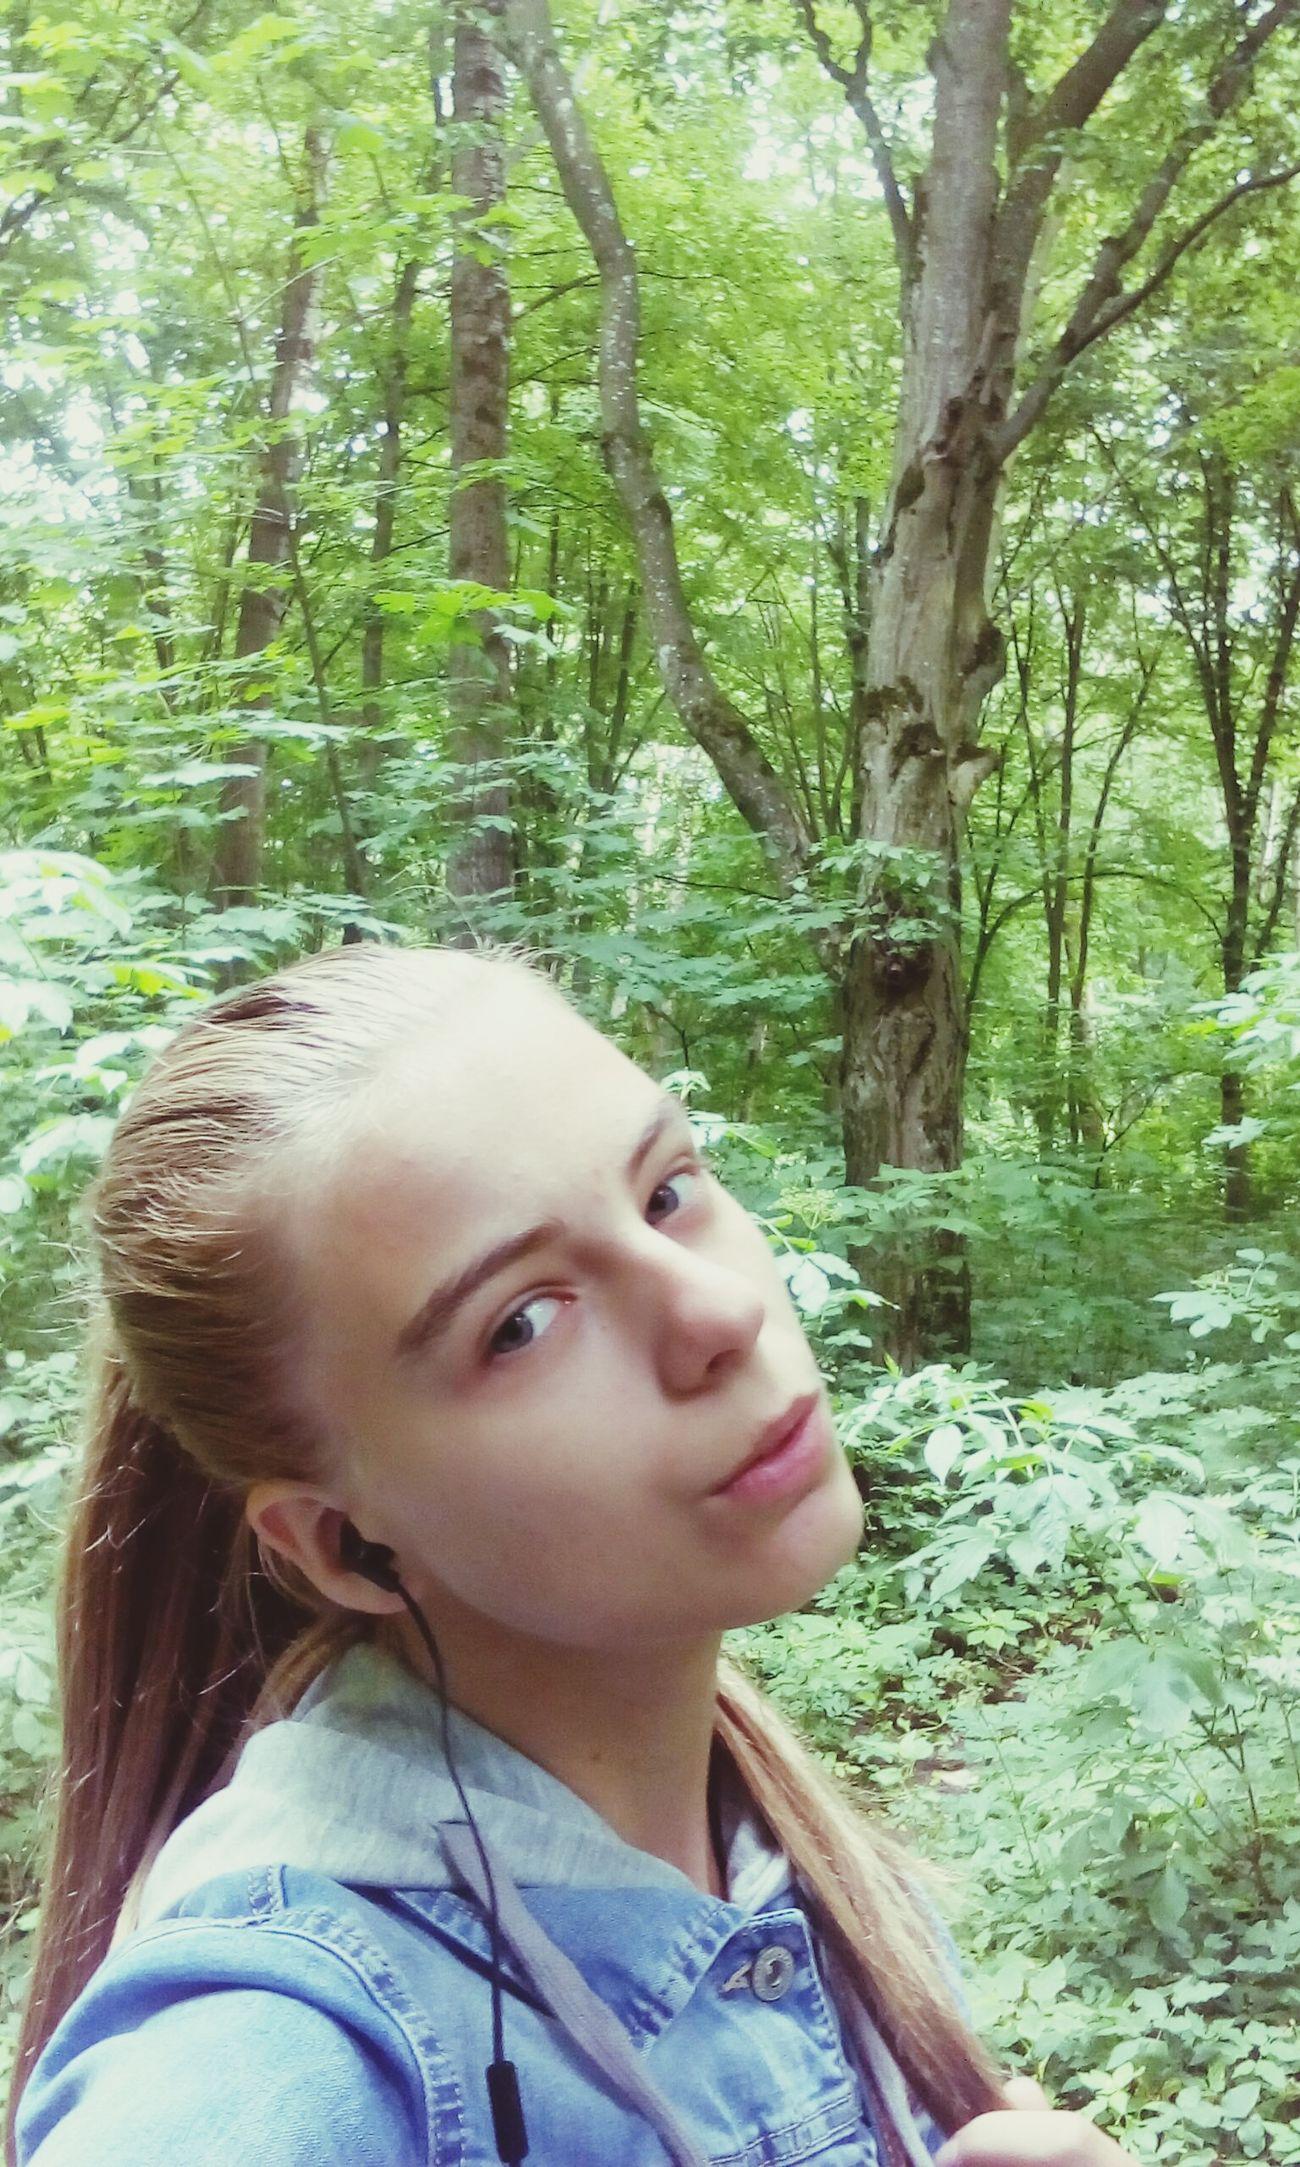 Немножечко селфи лес и природа свежийвоздух